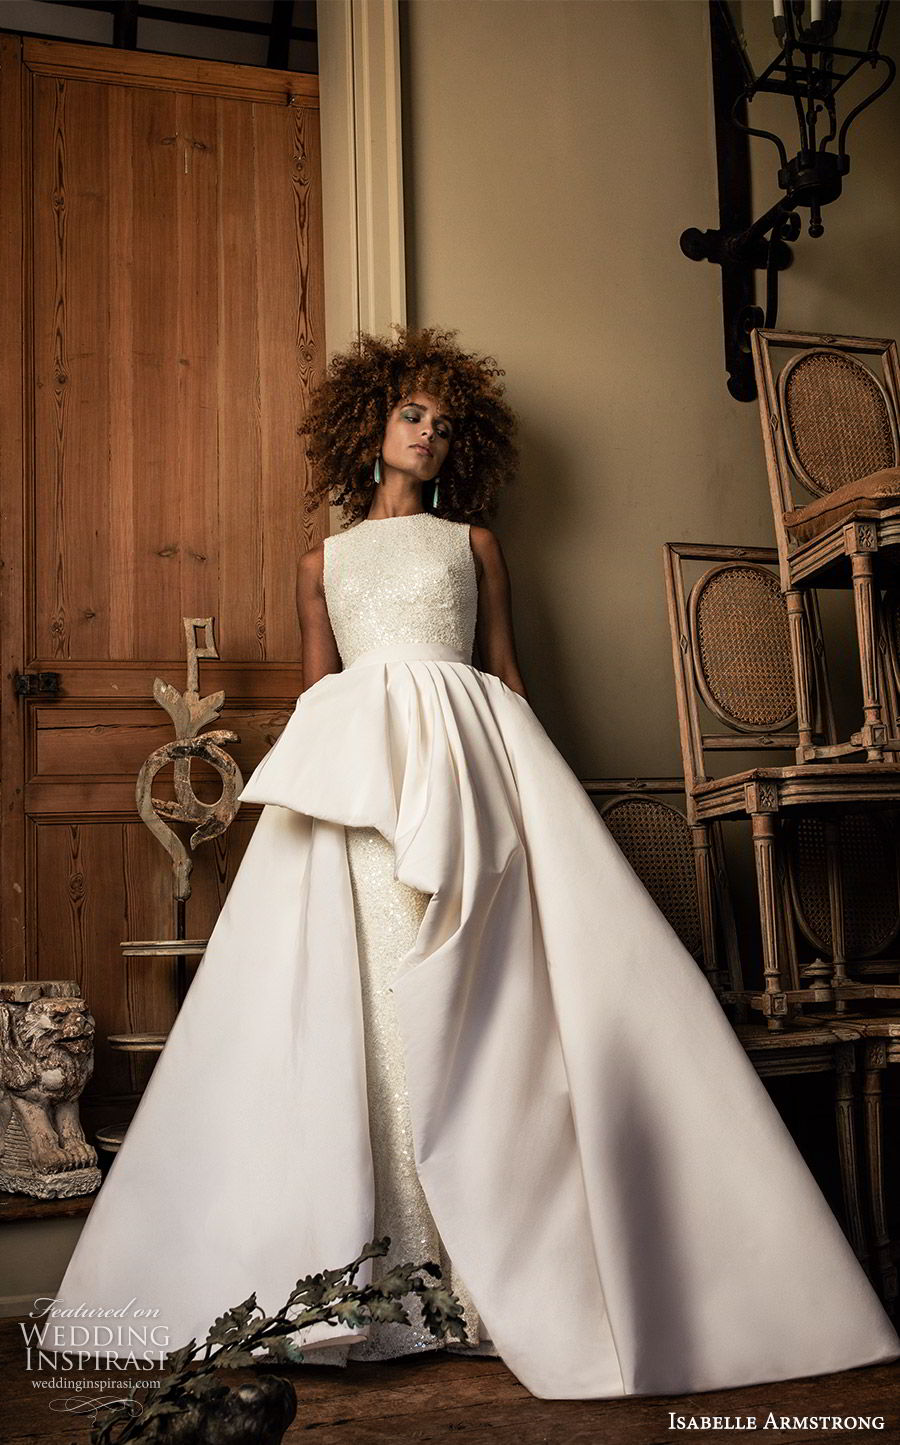 isabelle armstrong fall 2019 bridal sleeveless jewel neckline fully embellished fit flare sheath wedding dress ball gown overskirt (7) modern elegant mv